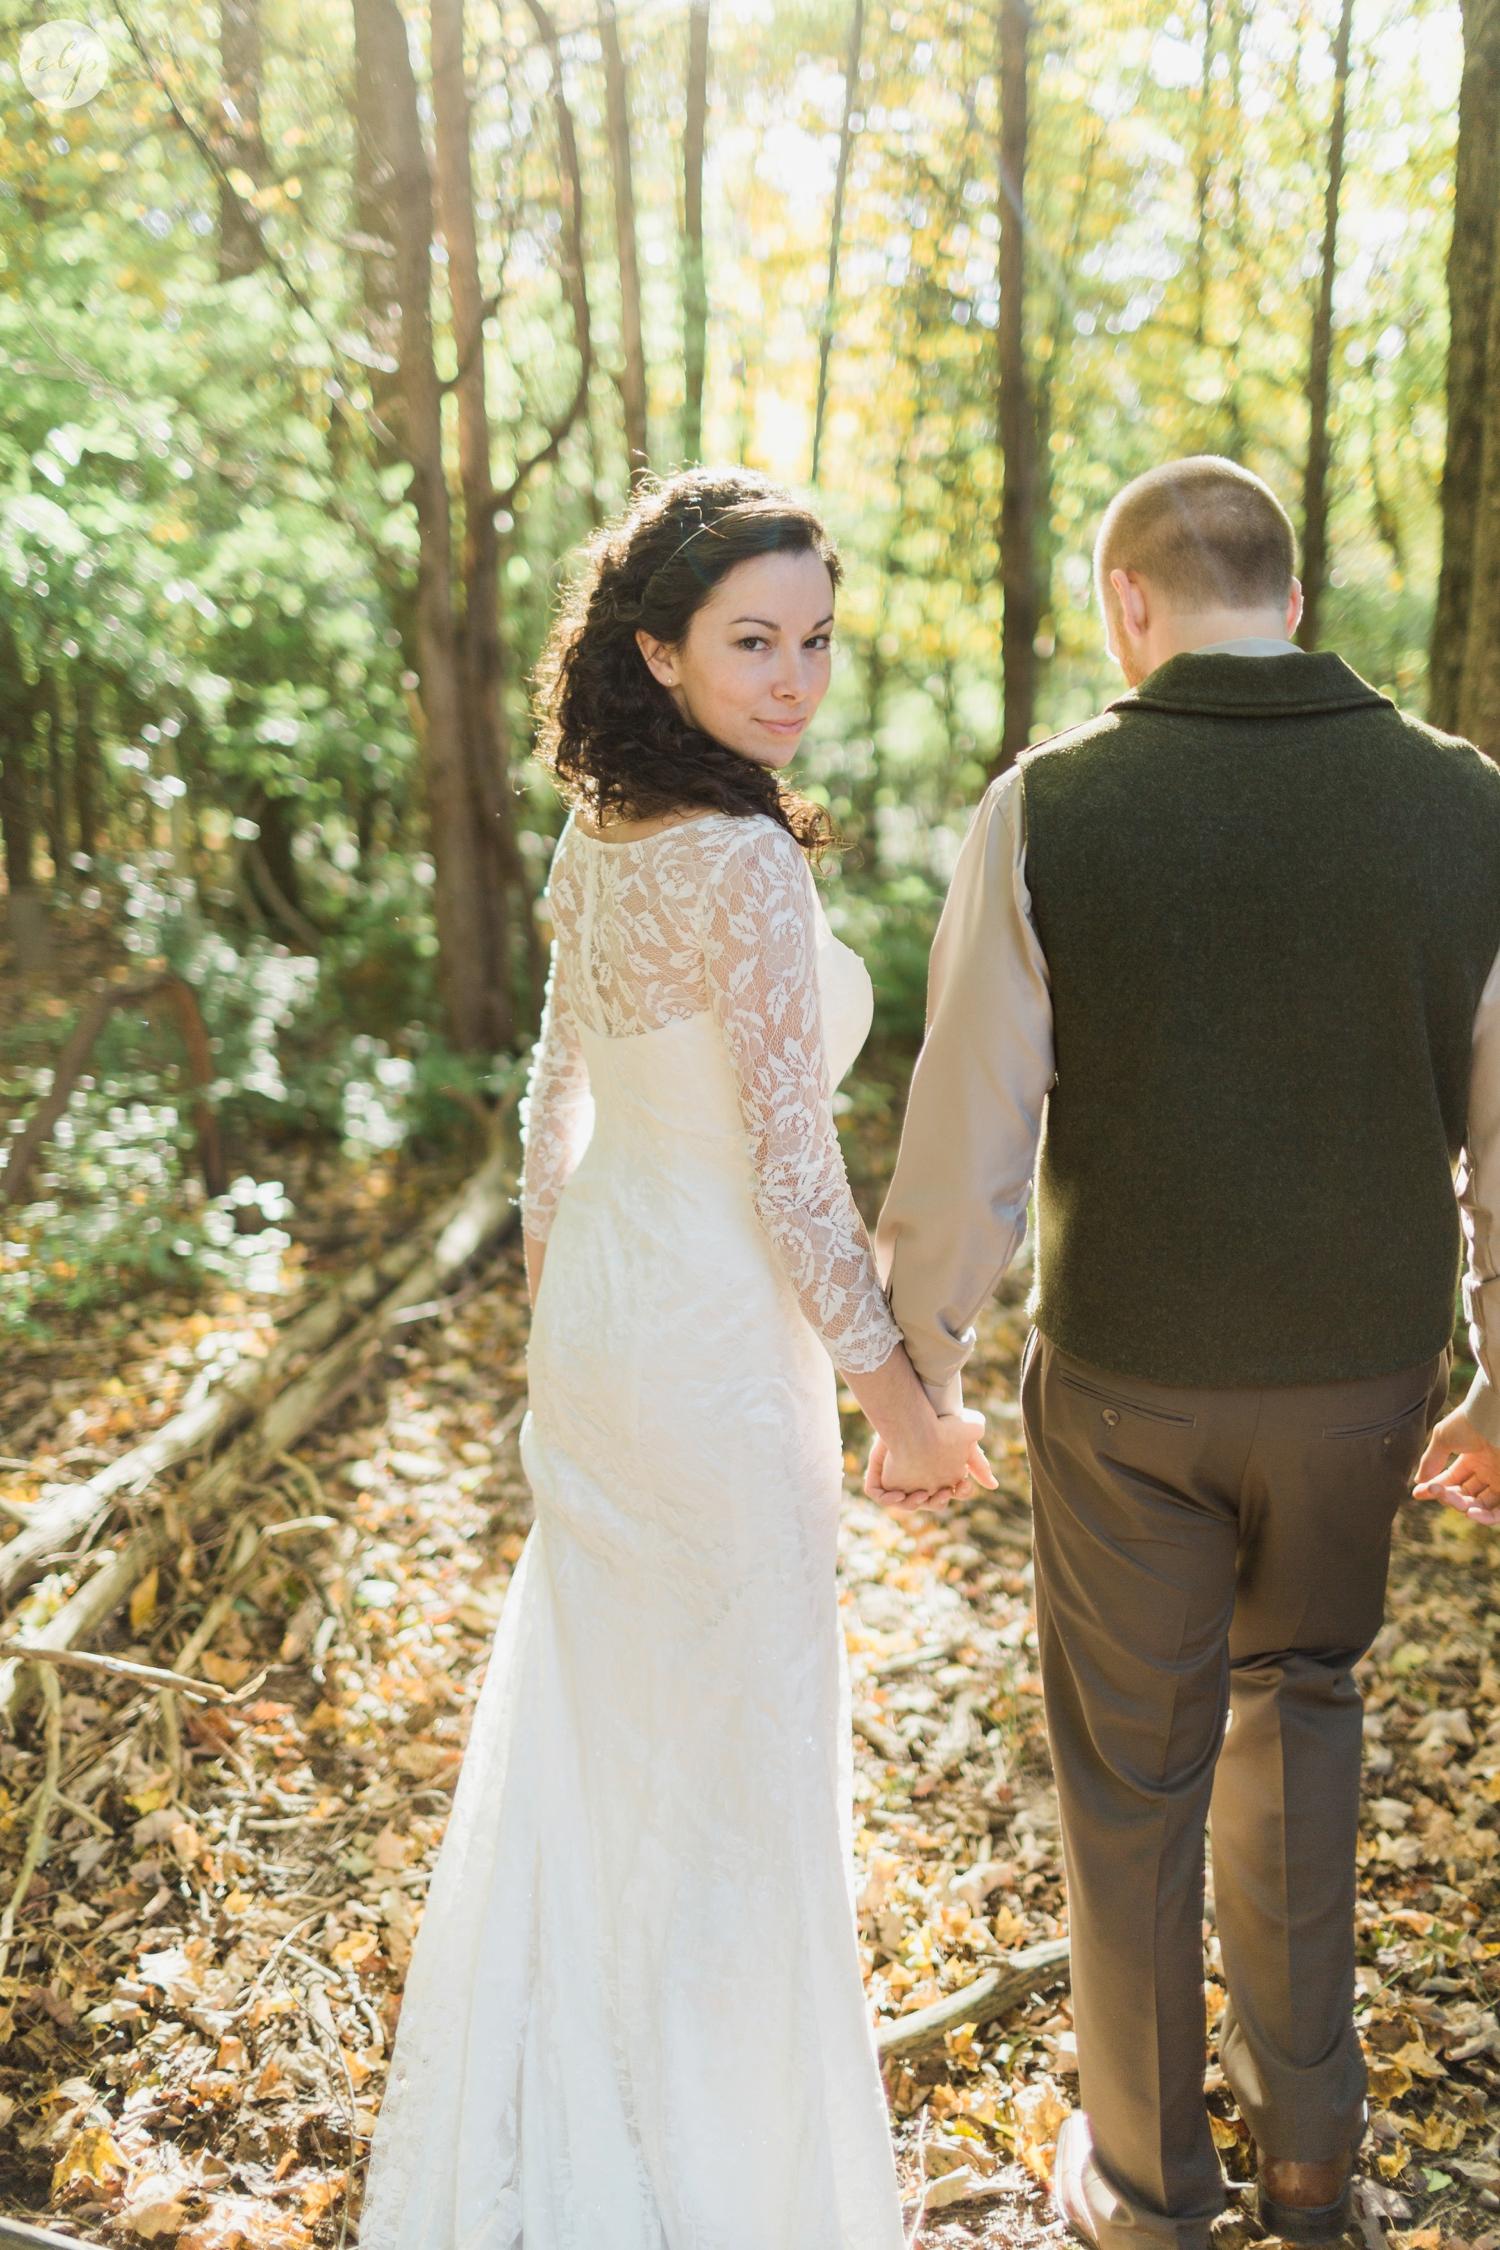 Outdoor-Wedding-in-the-Woods-Photography_4267.jpg